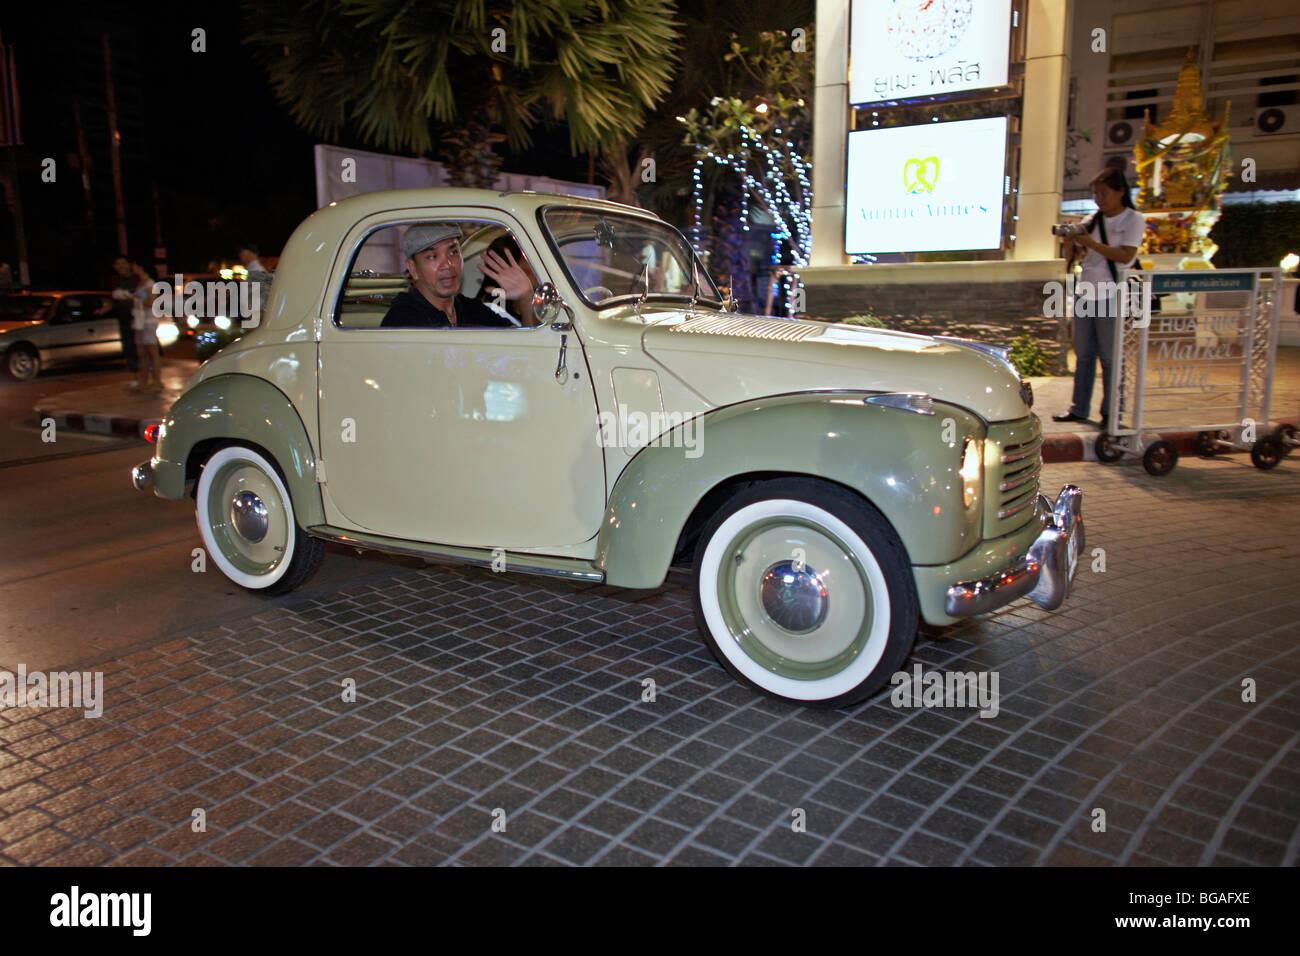 Fiat 500 coupe Italian classic car - Stock Image